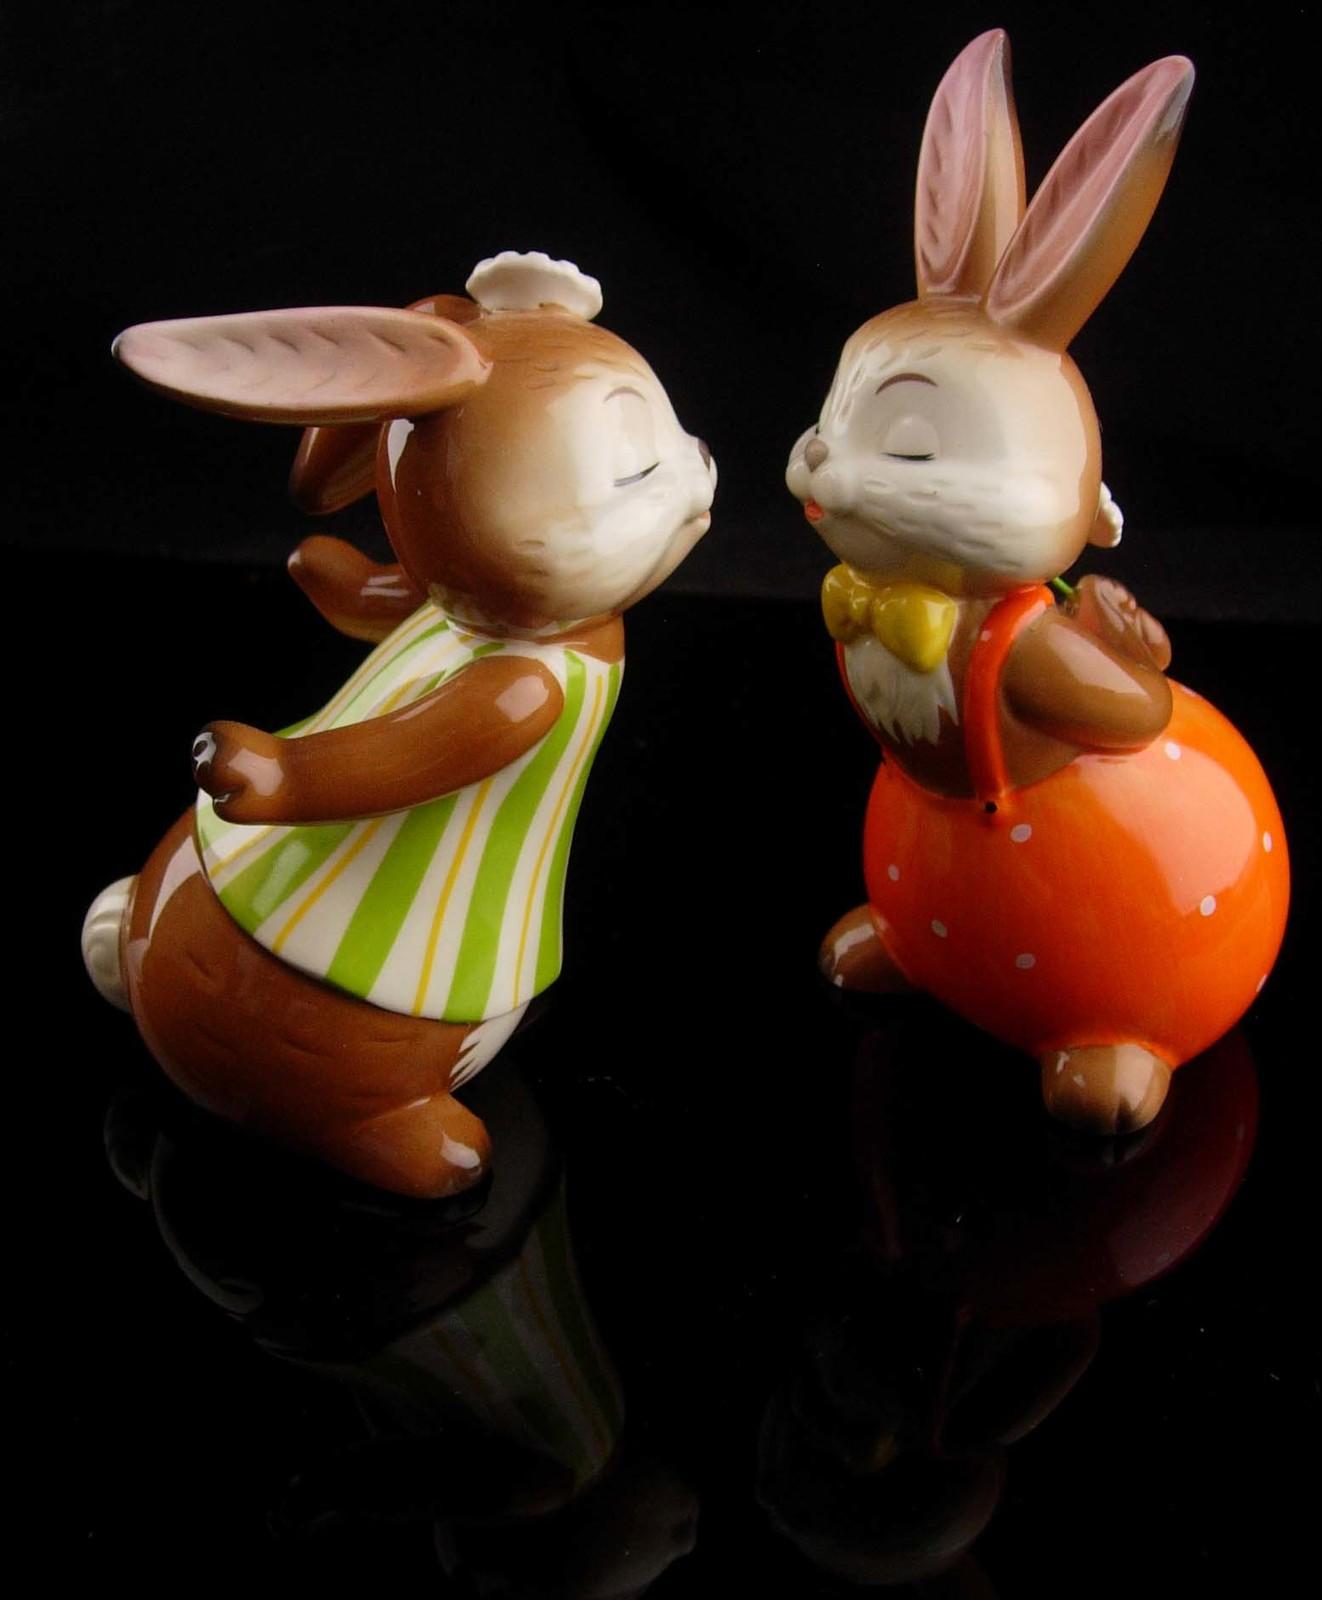 Vintage kissing bunny goebel - new mom gift - mothers day gift - german figurine